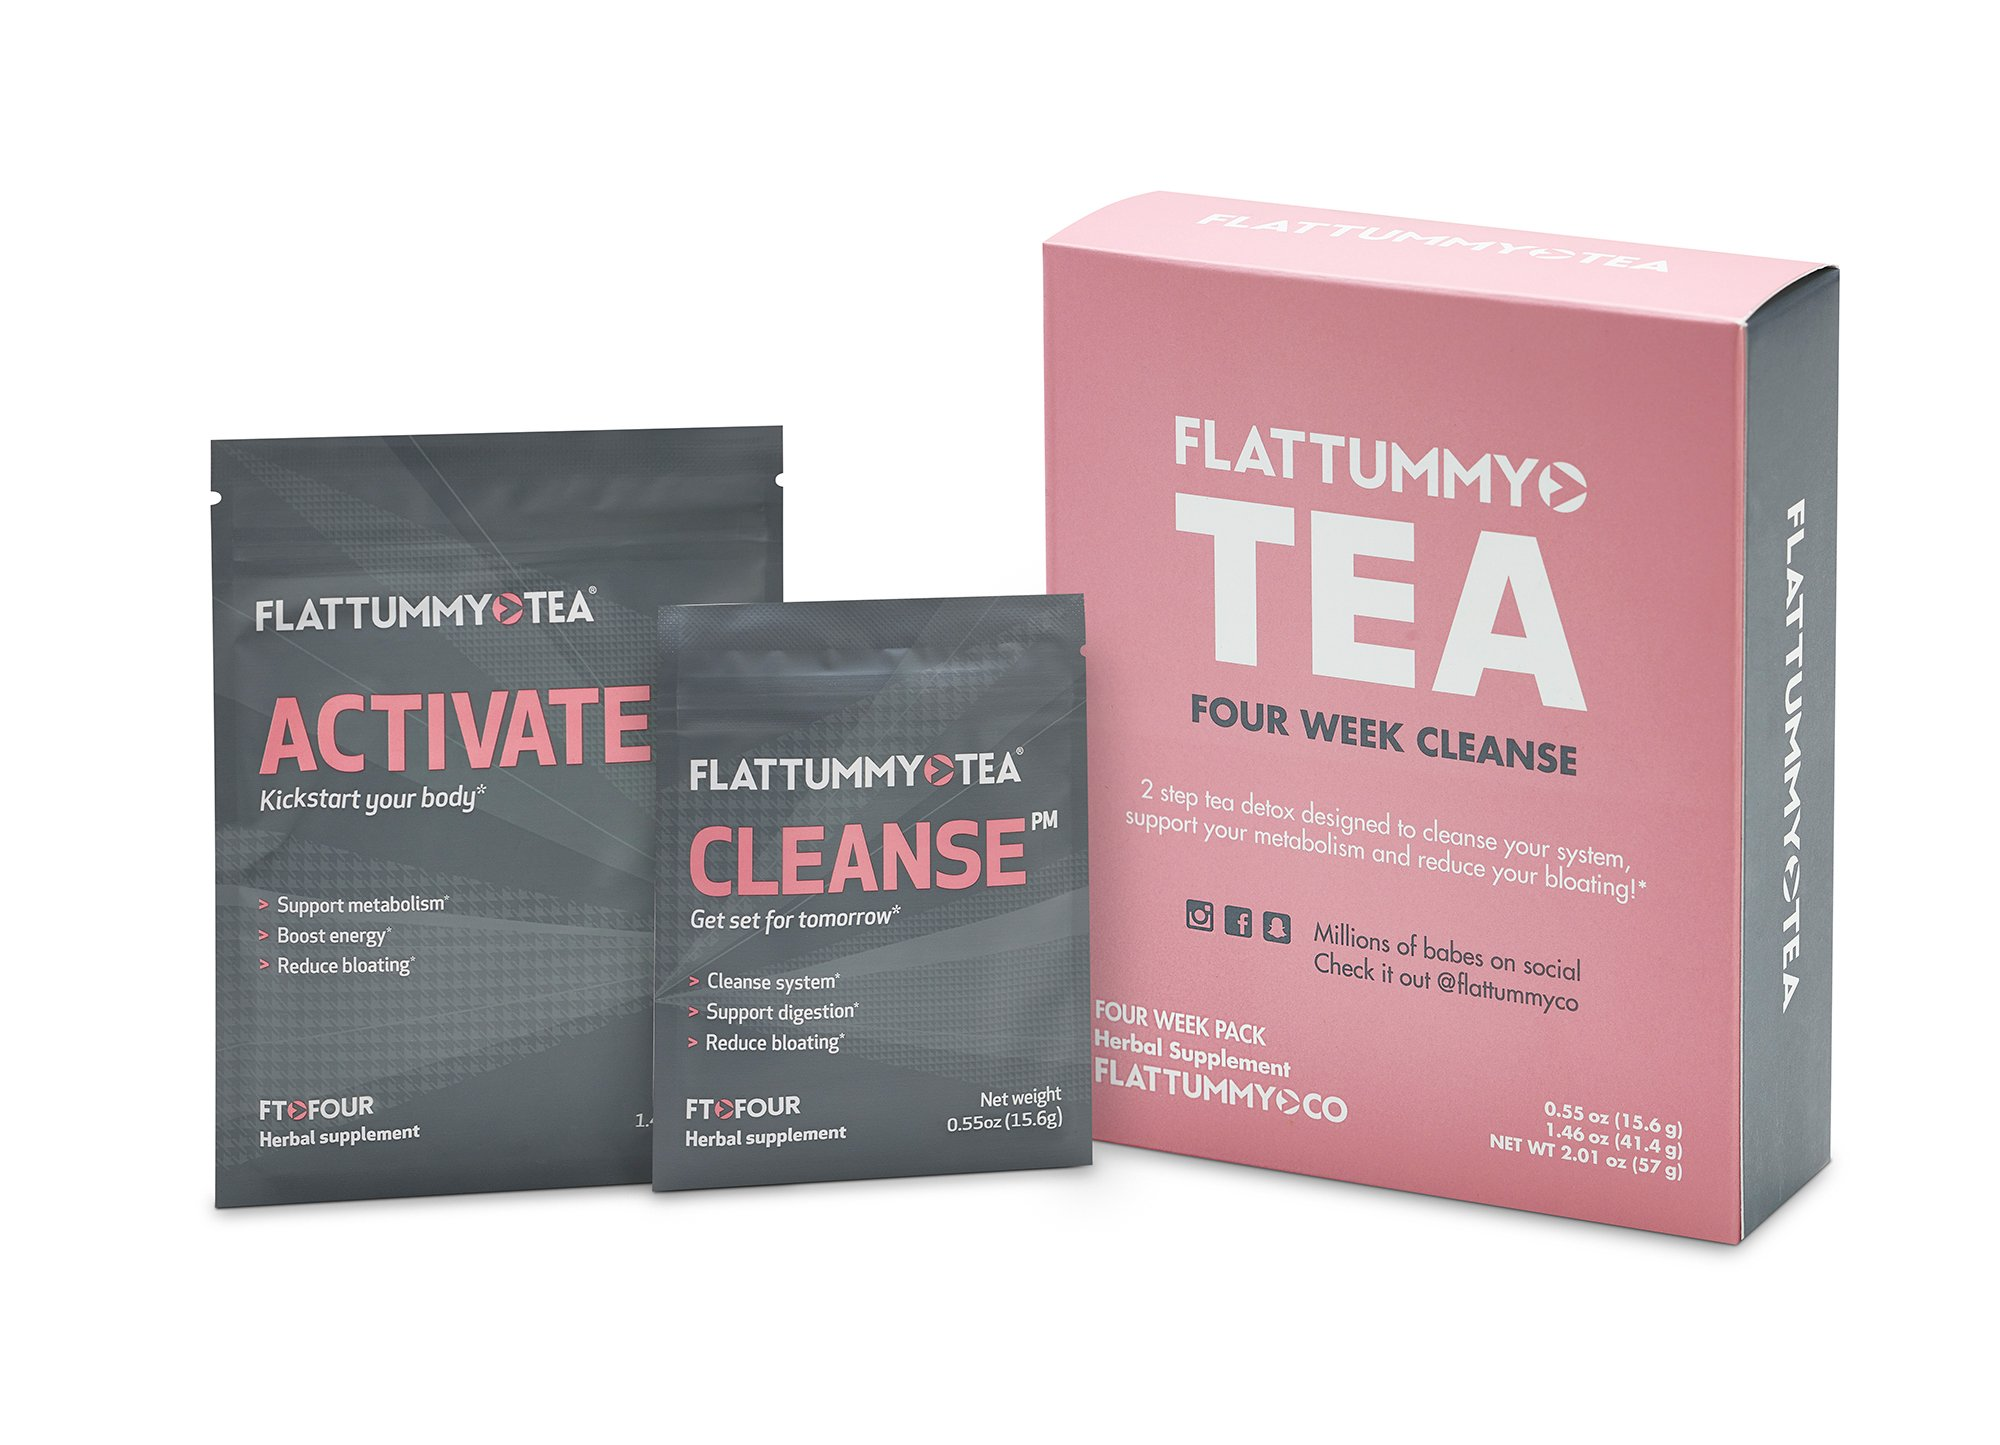 Flat Tummy Tea 4-Week Detox Herbal Tea to Help Kick That Bloated and Sluggish Feeling by Flat Tummy Tea